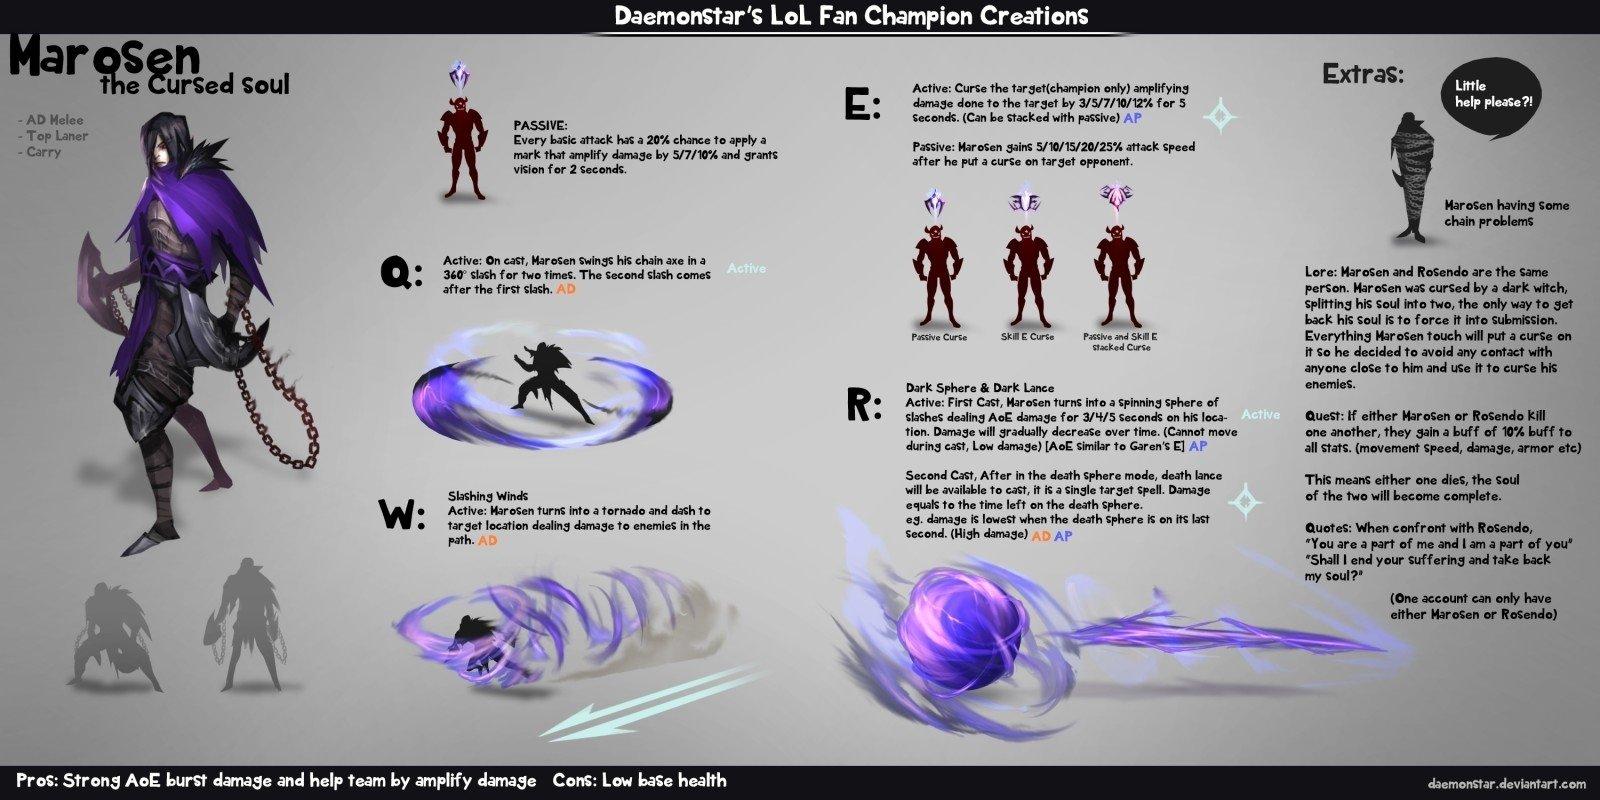 10 Best League Of Legends Champion Ideas lol fan champion creations marosendaemonstar on deviantart 2021